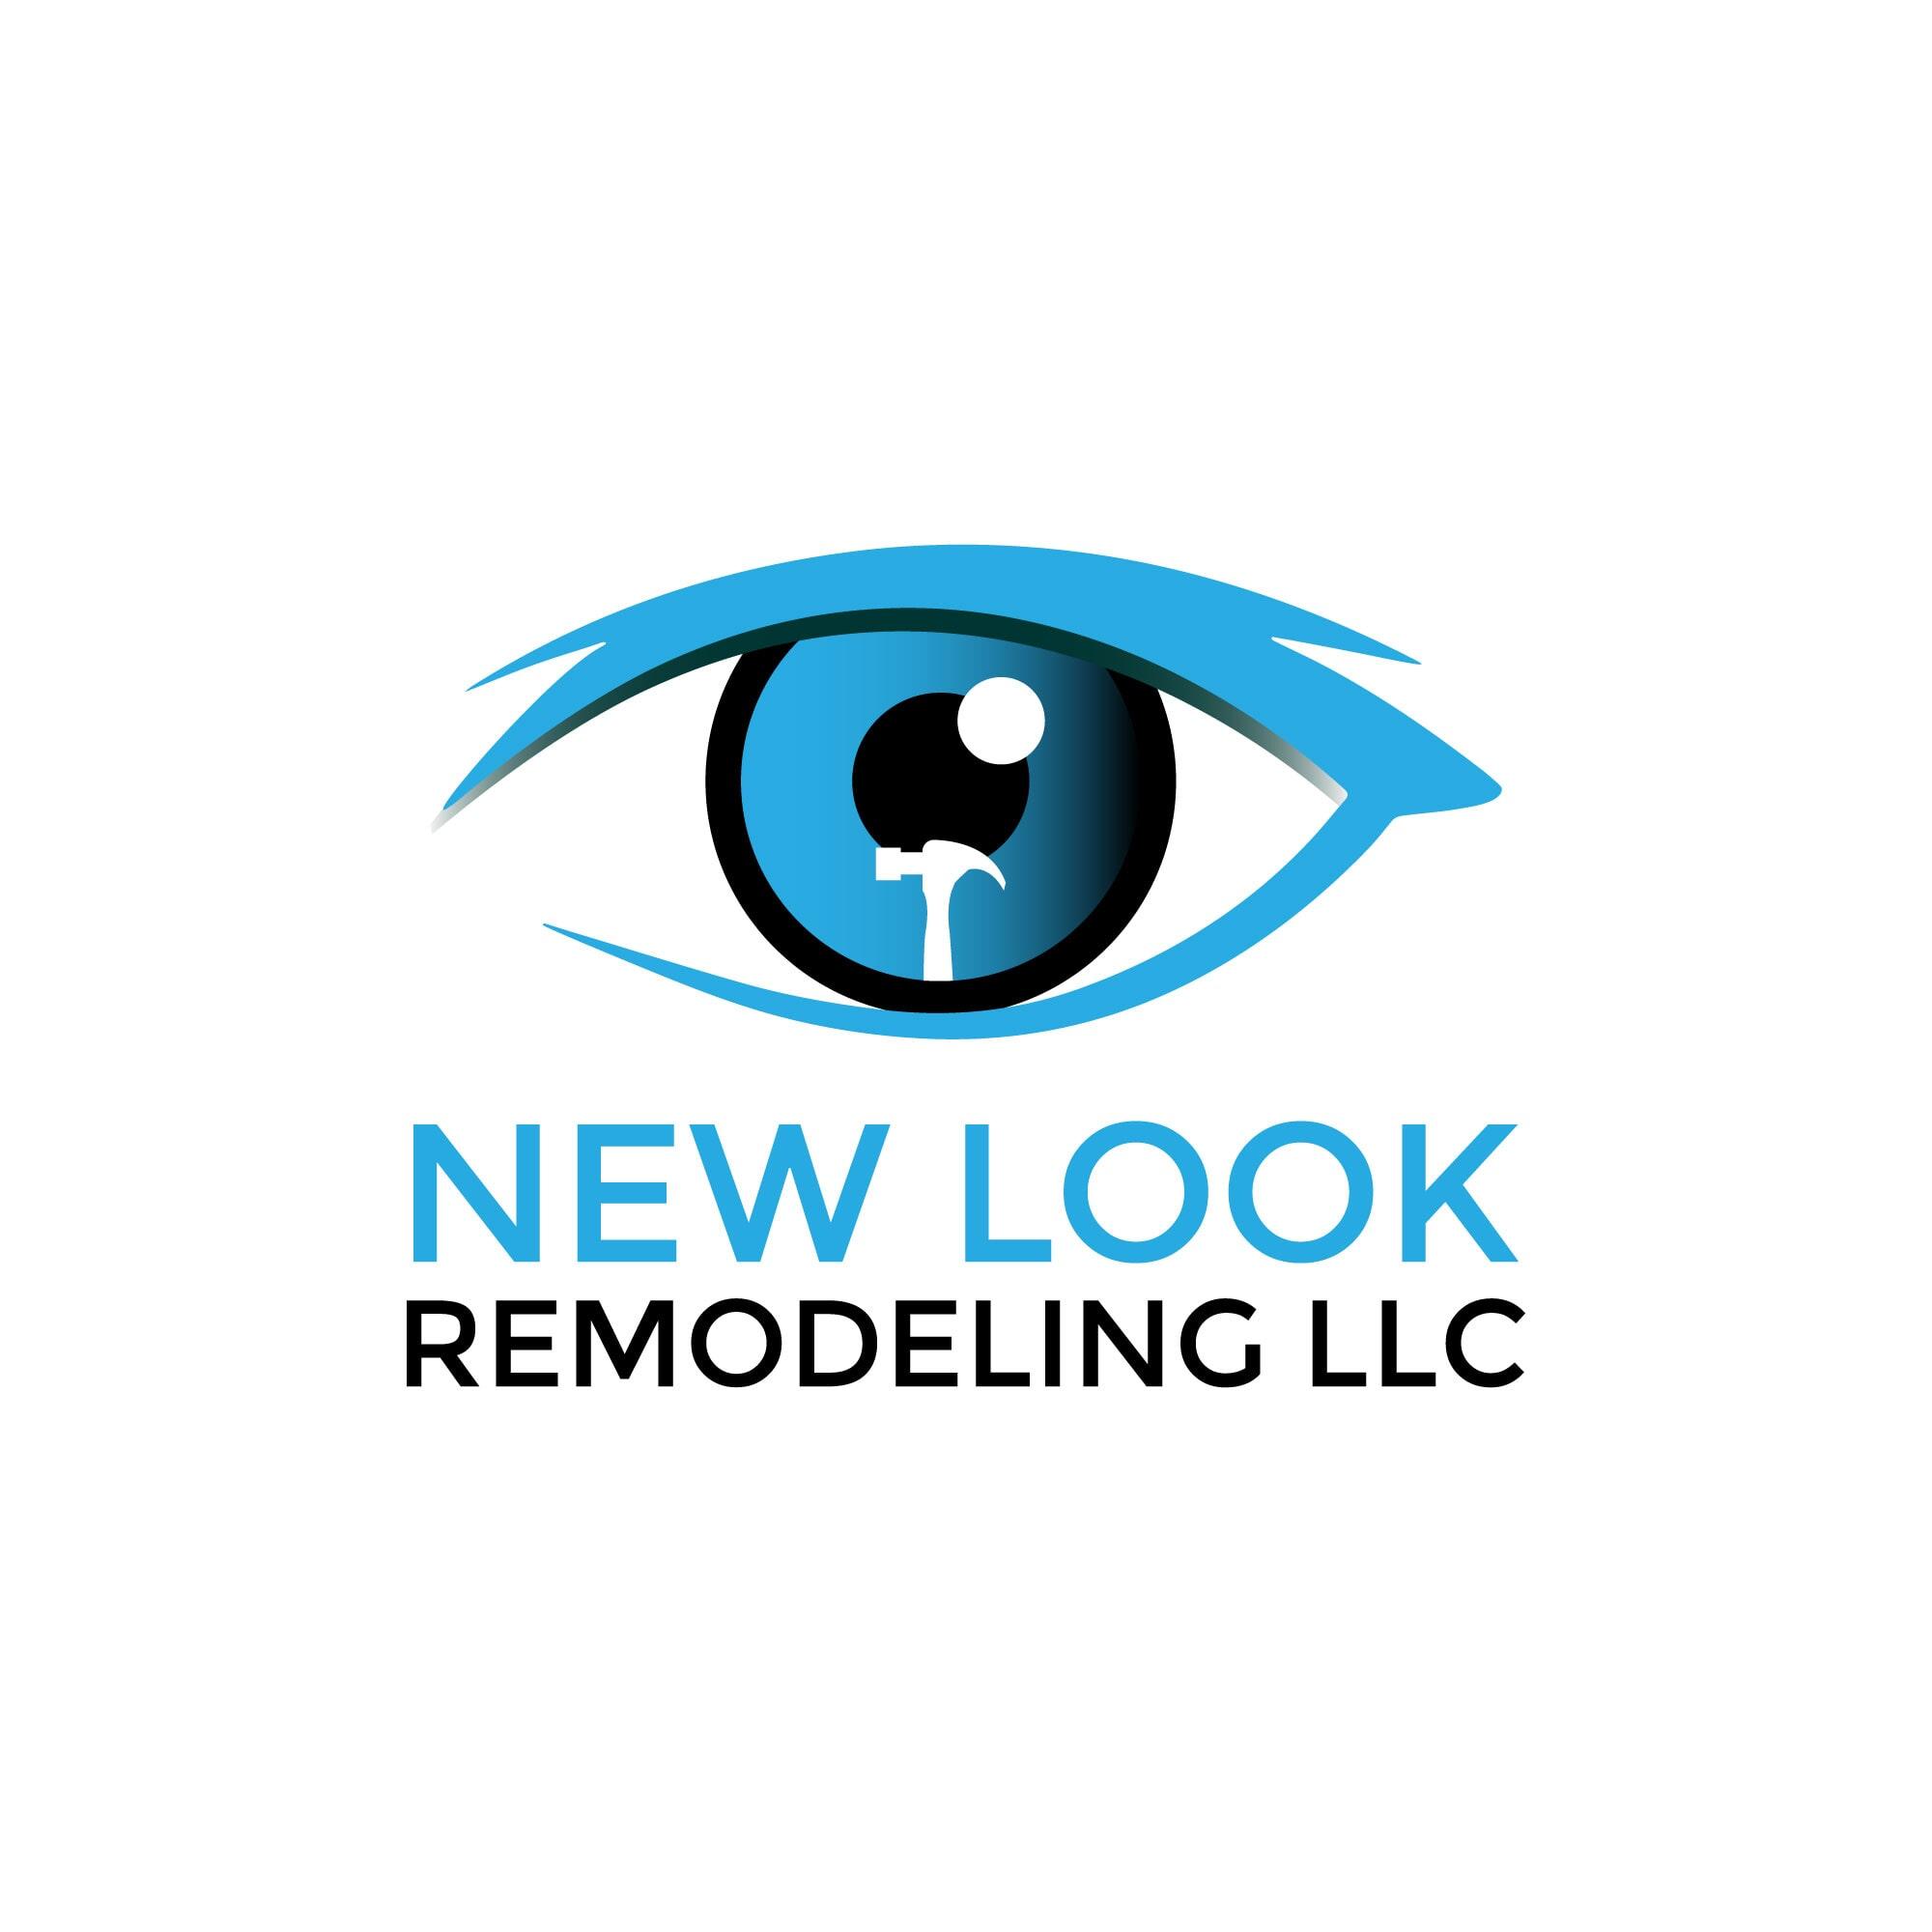 New Look Remodeling LLC